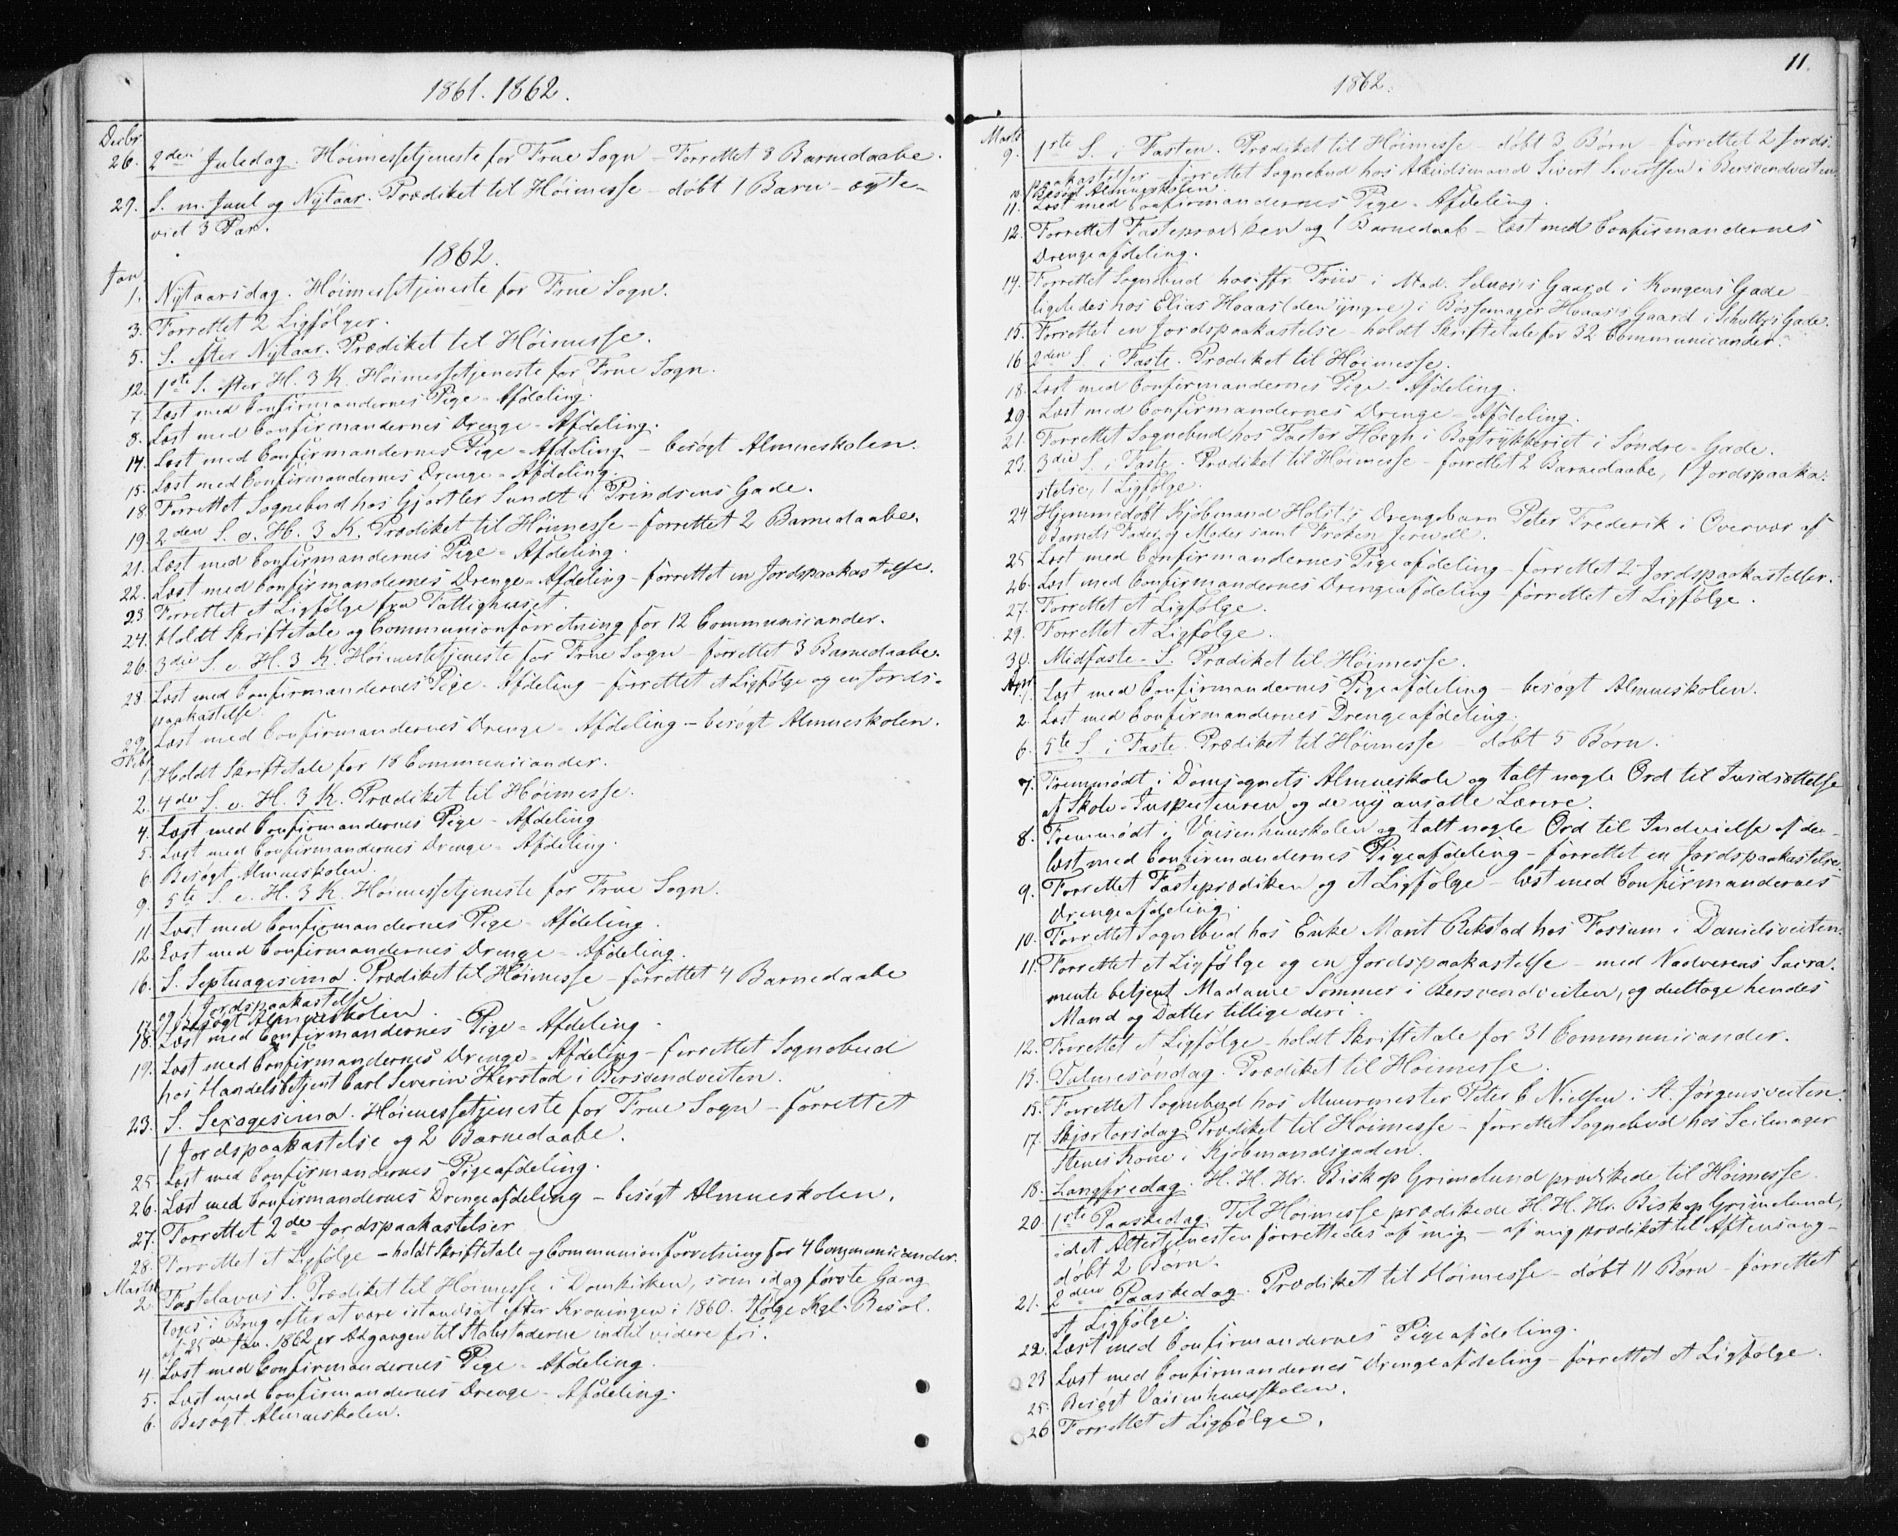 SAT, Ministerialprotokoller, klokkerbøker og fødselsregistre - Sør-Trøndelag, 601/L0053: Parish register (official) no. 601A21, 1857-1865, p. 11